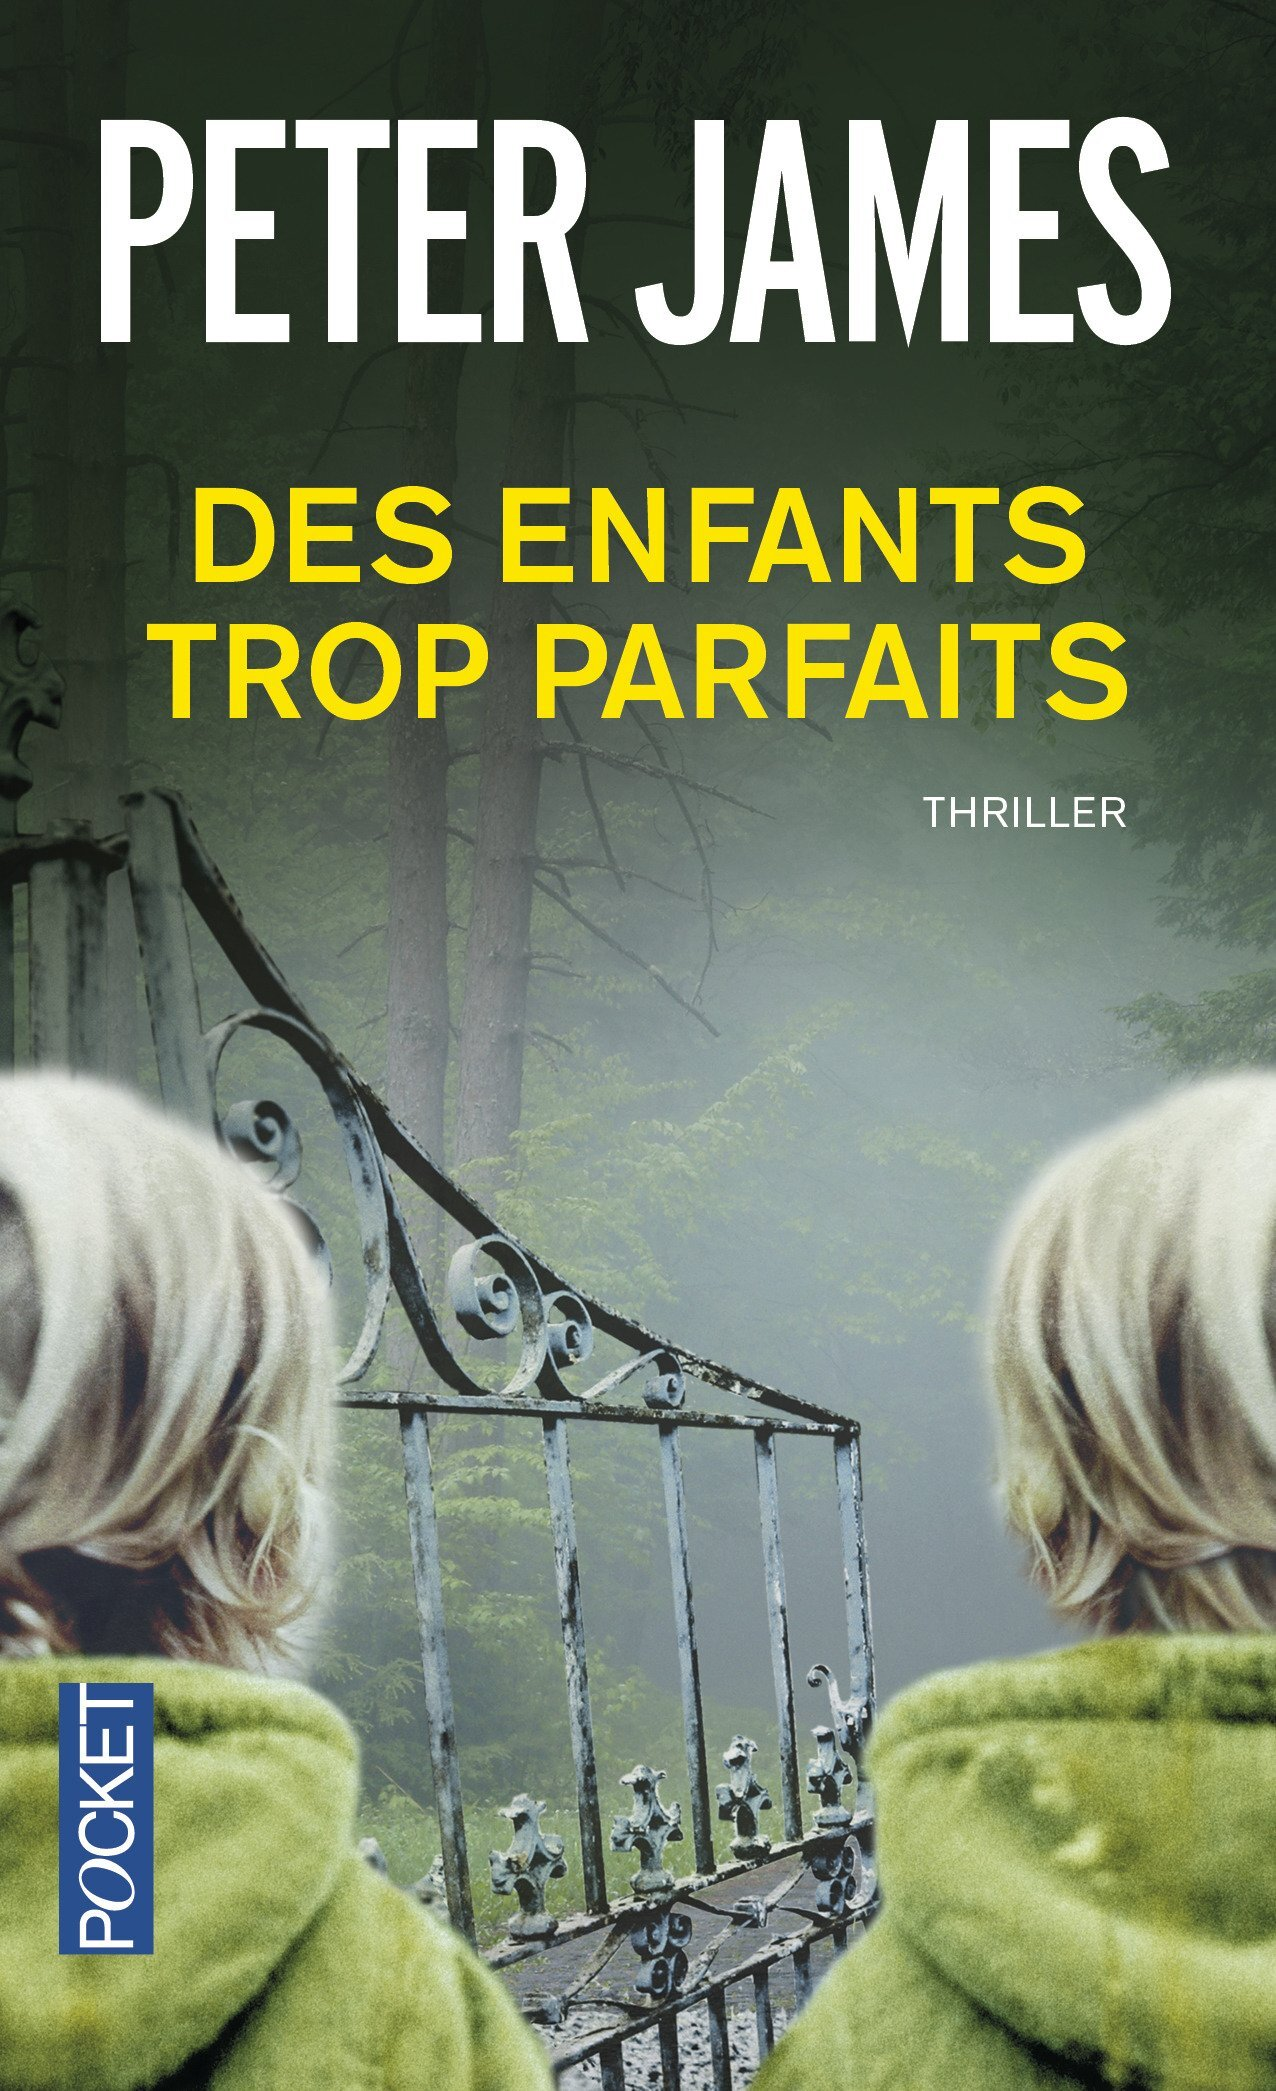 cdn1.booknode.com/book_cover/629/full/des-enfants-trop-parfaits-629373.jpg